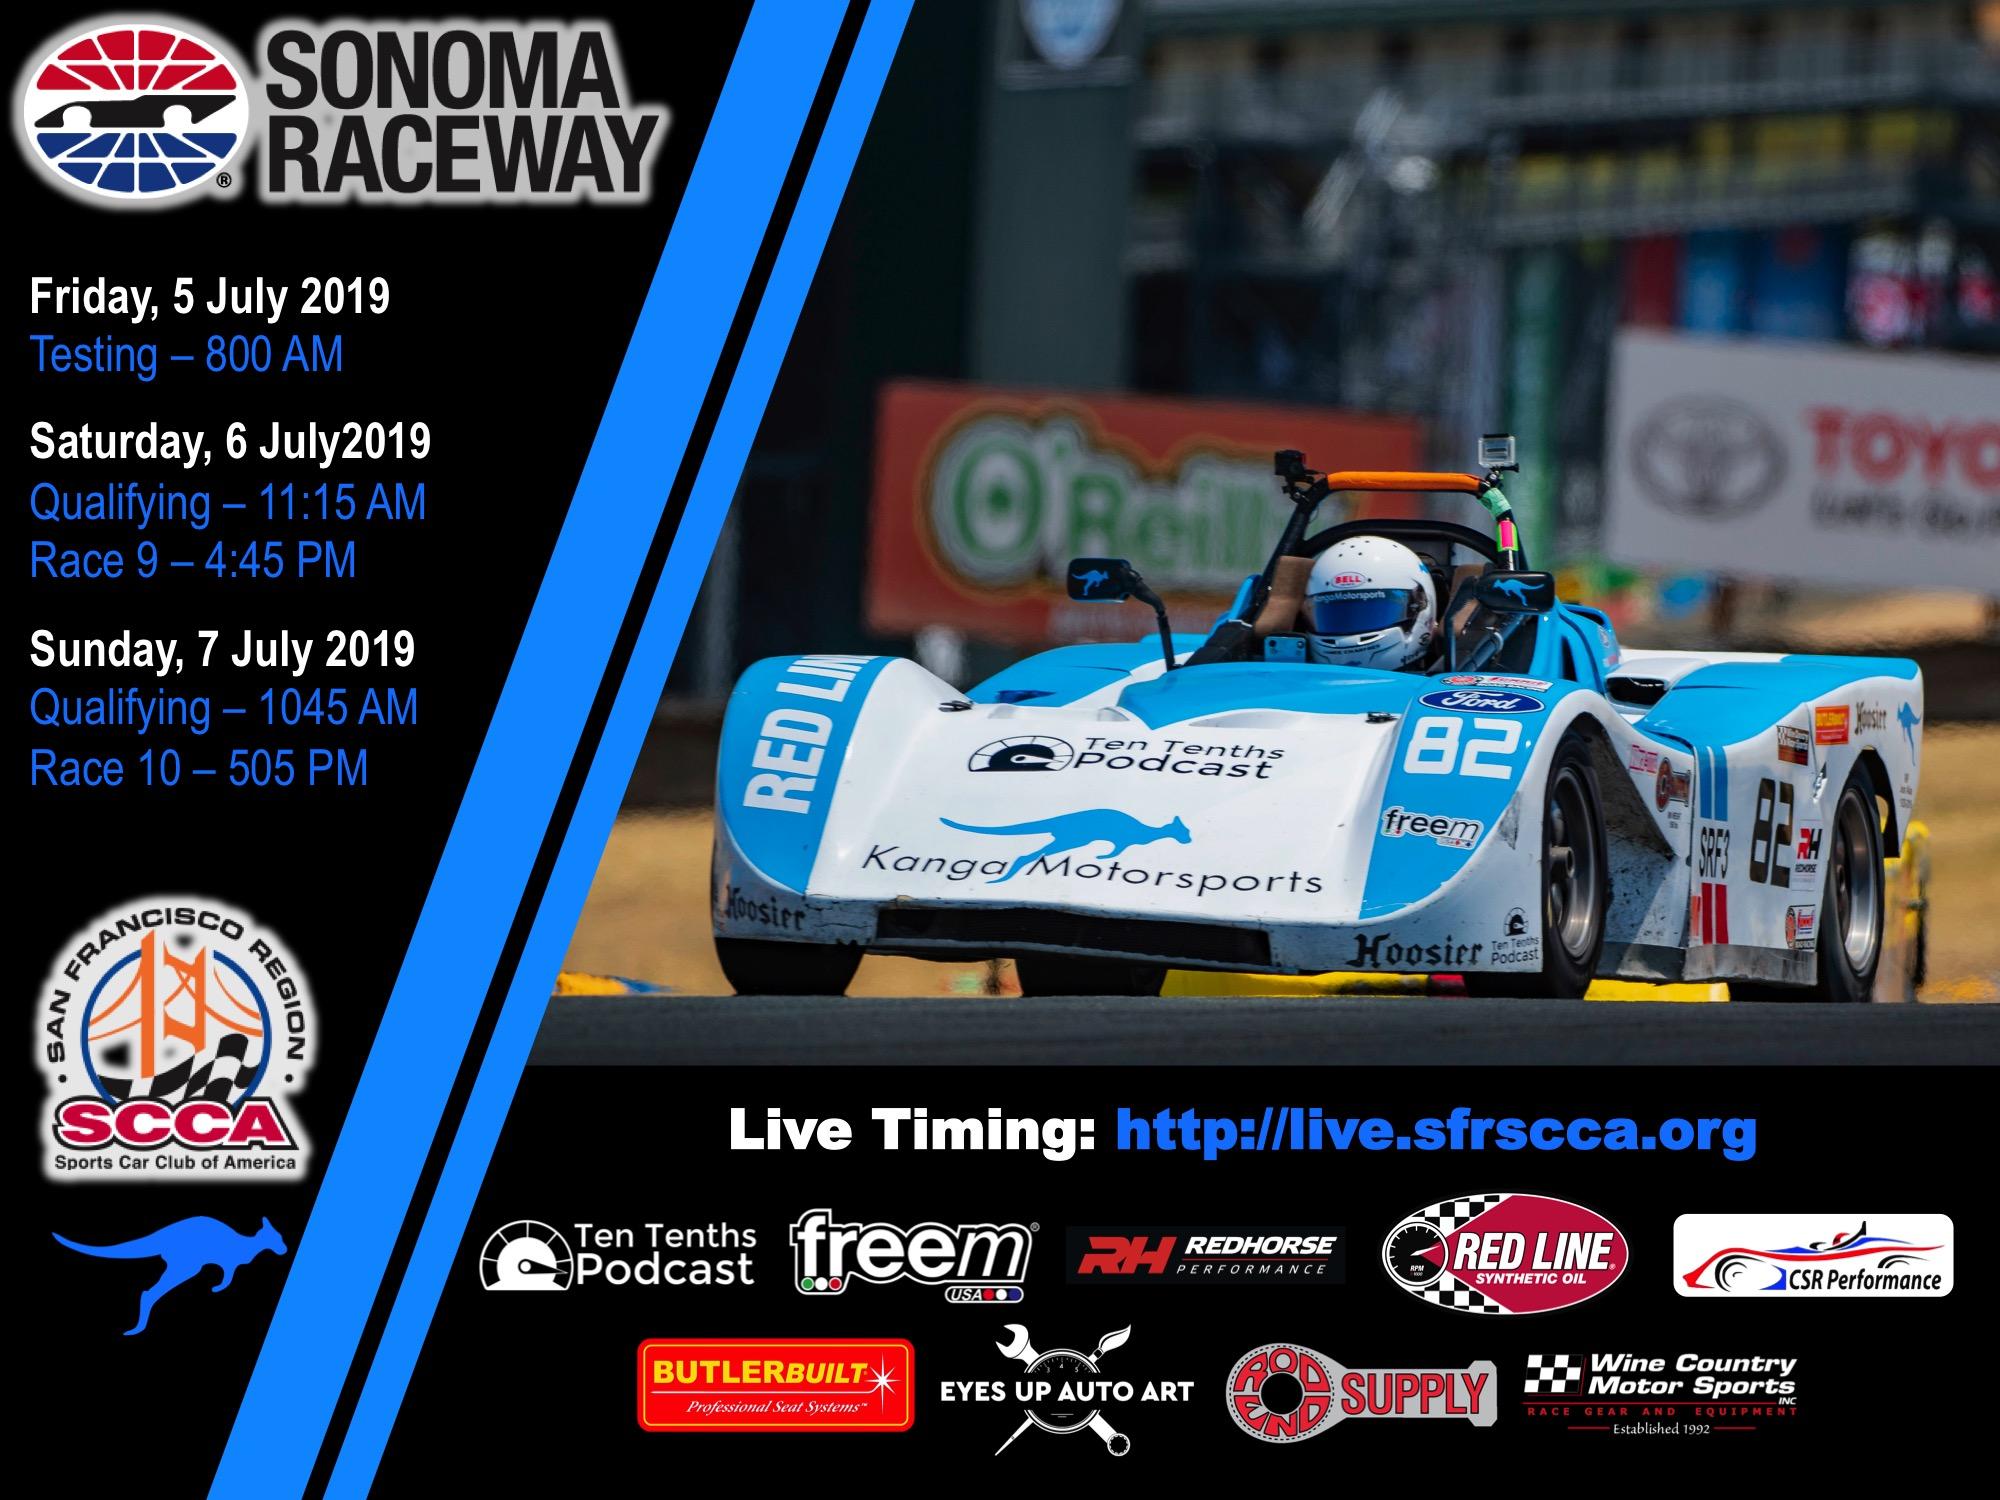 2019 Sonoma Raceway Event Races 9 & 10.jpg